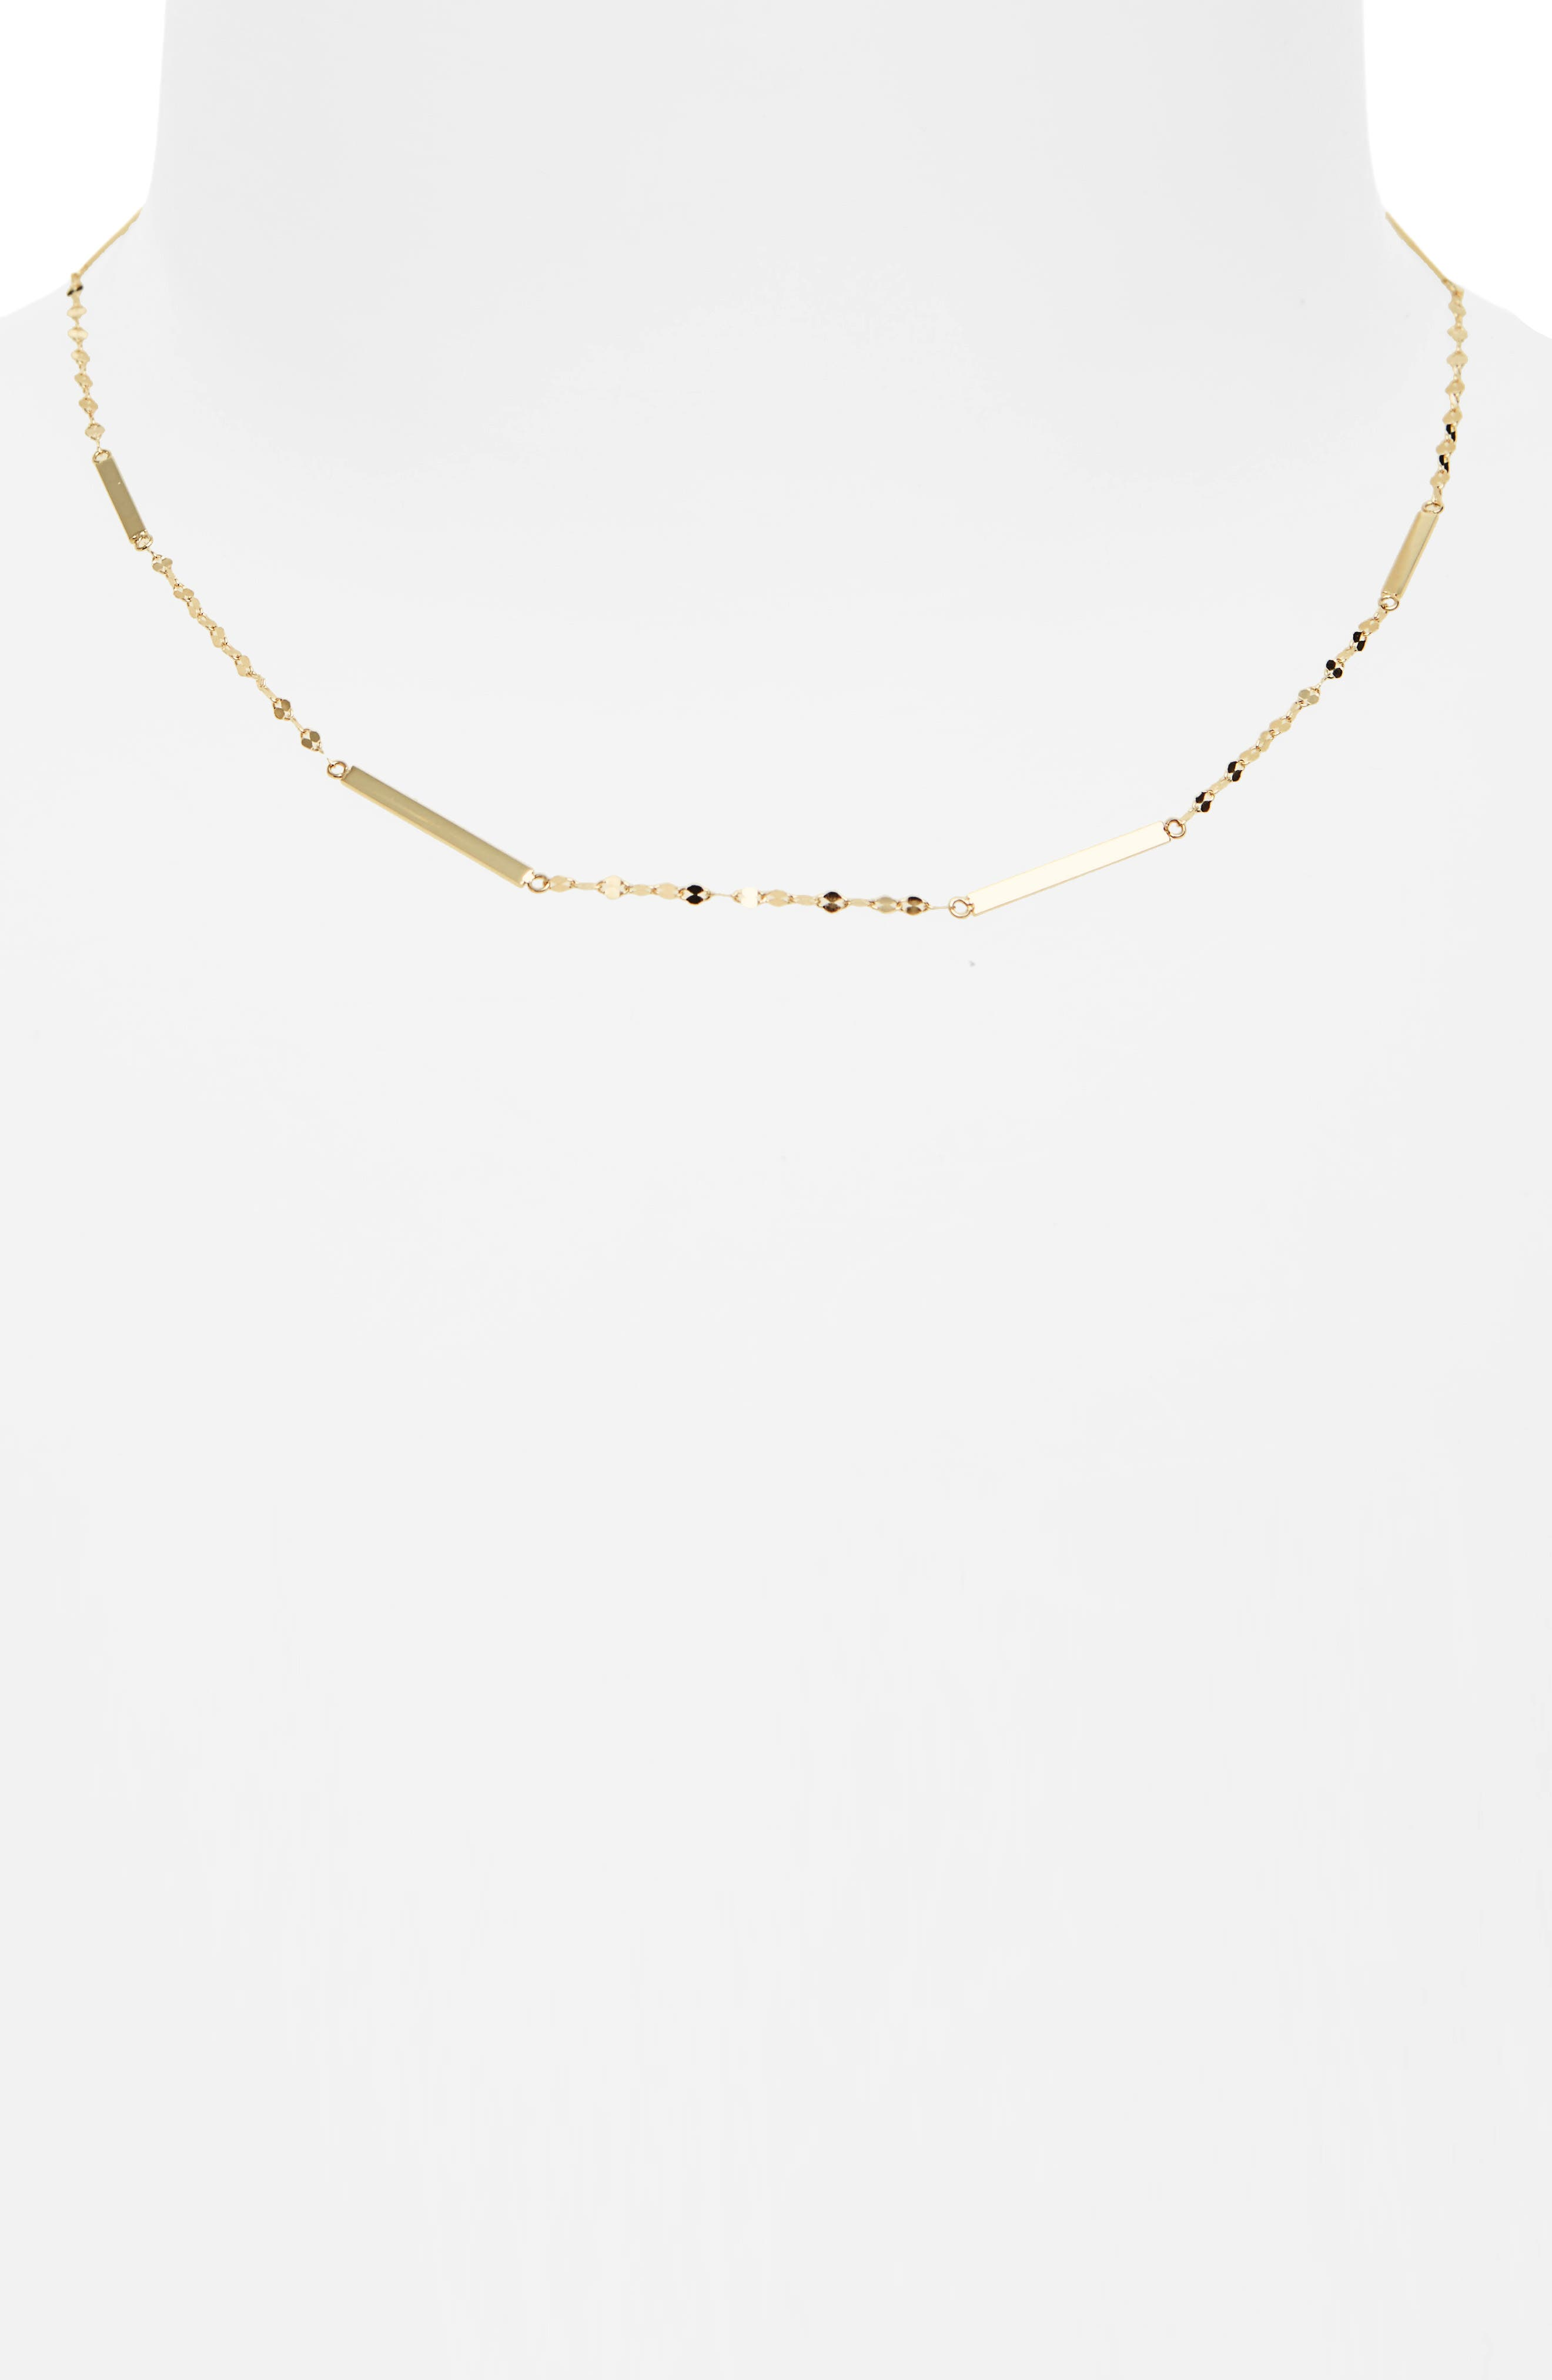 Main Image - Lana Jewelry Short Bar Station Necklace